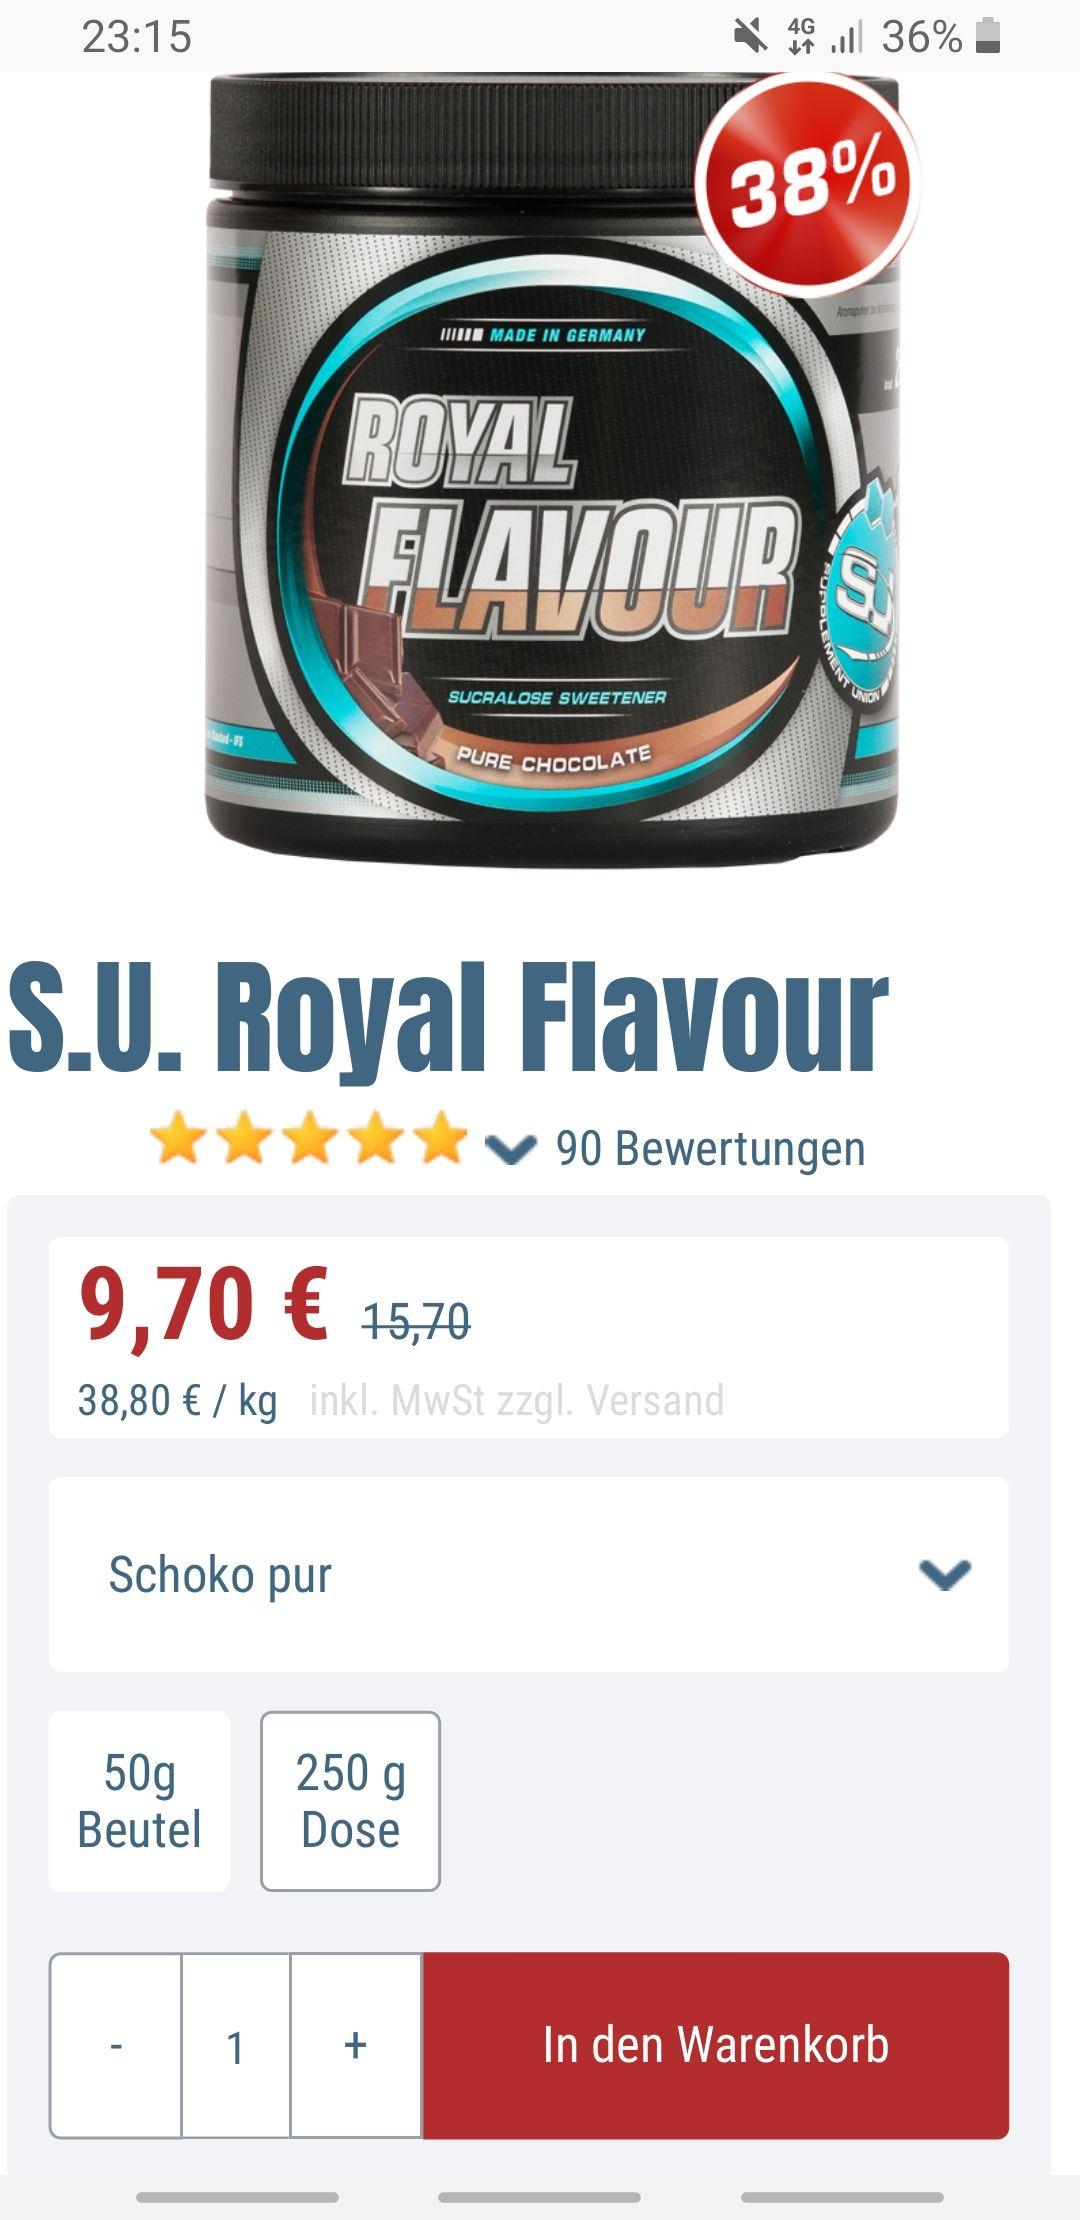 S.U Royal Flavour Pure Chocolate - 250 Gramm